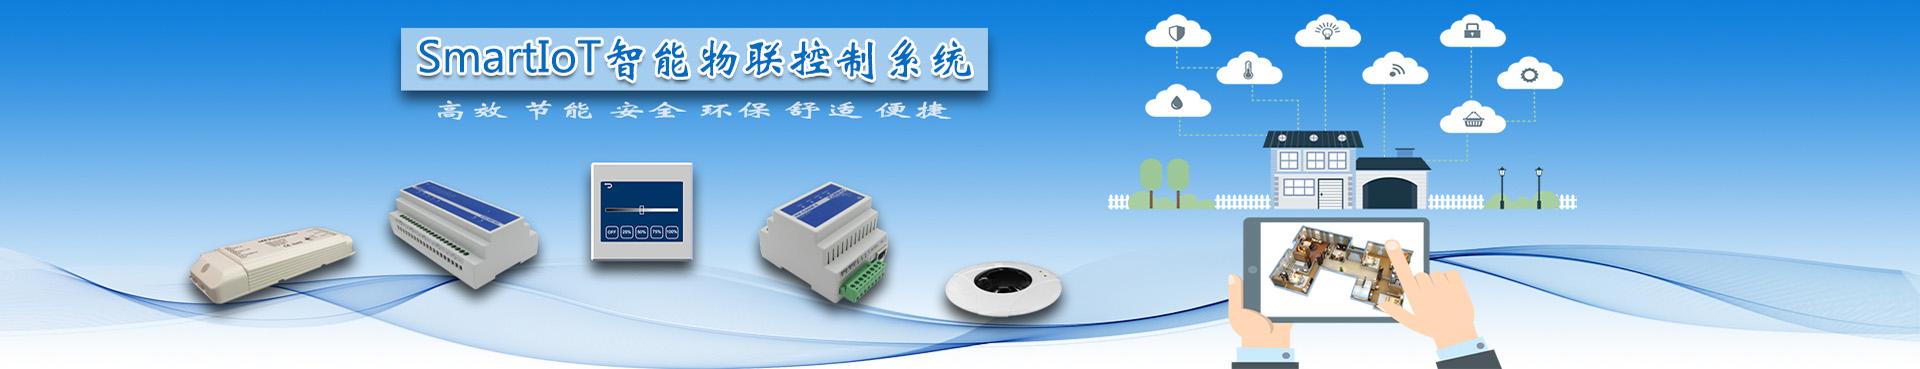 SmartIoT物联控制系统